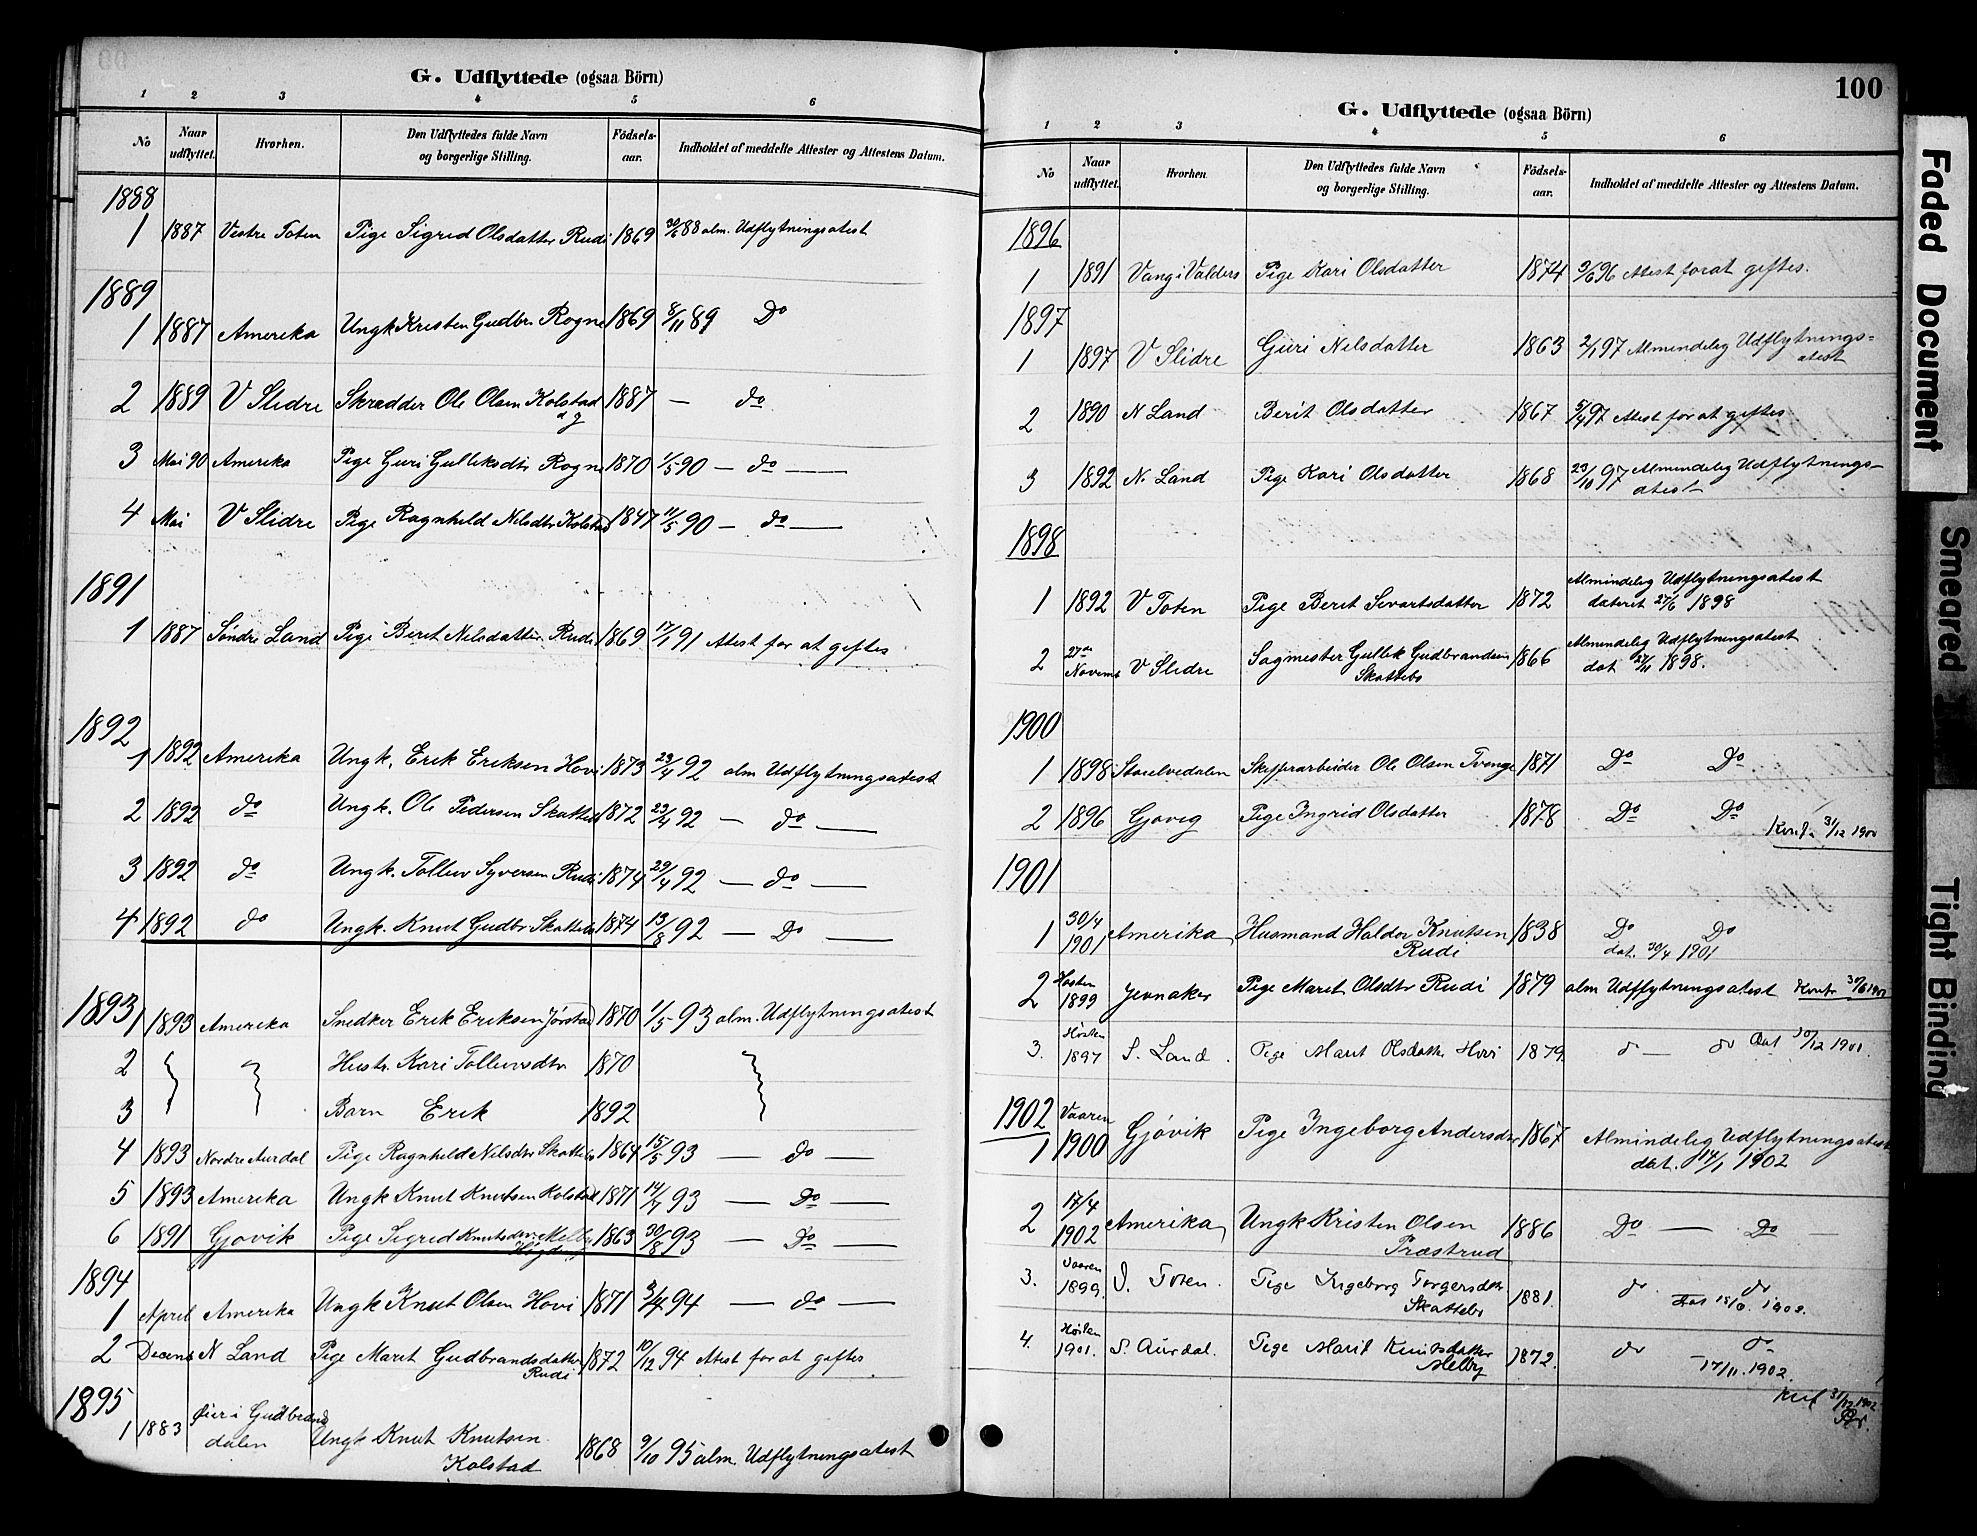 SAH, Øystre Slidre prestekontor, Klokkerbok nr. 5, 1887-1910, s. 100